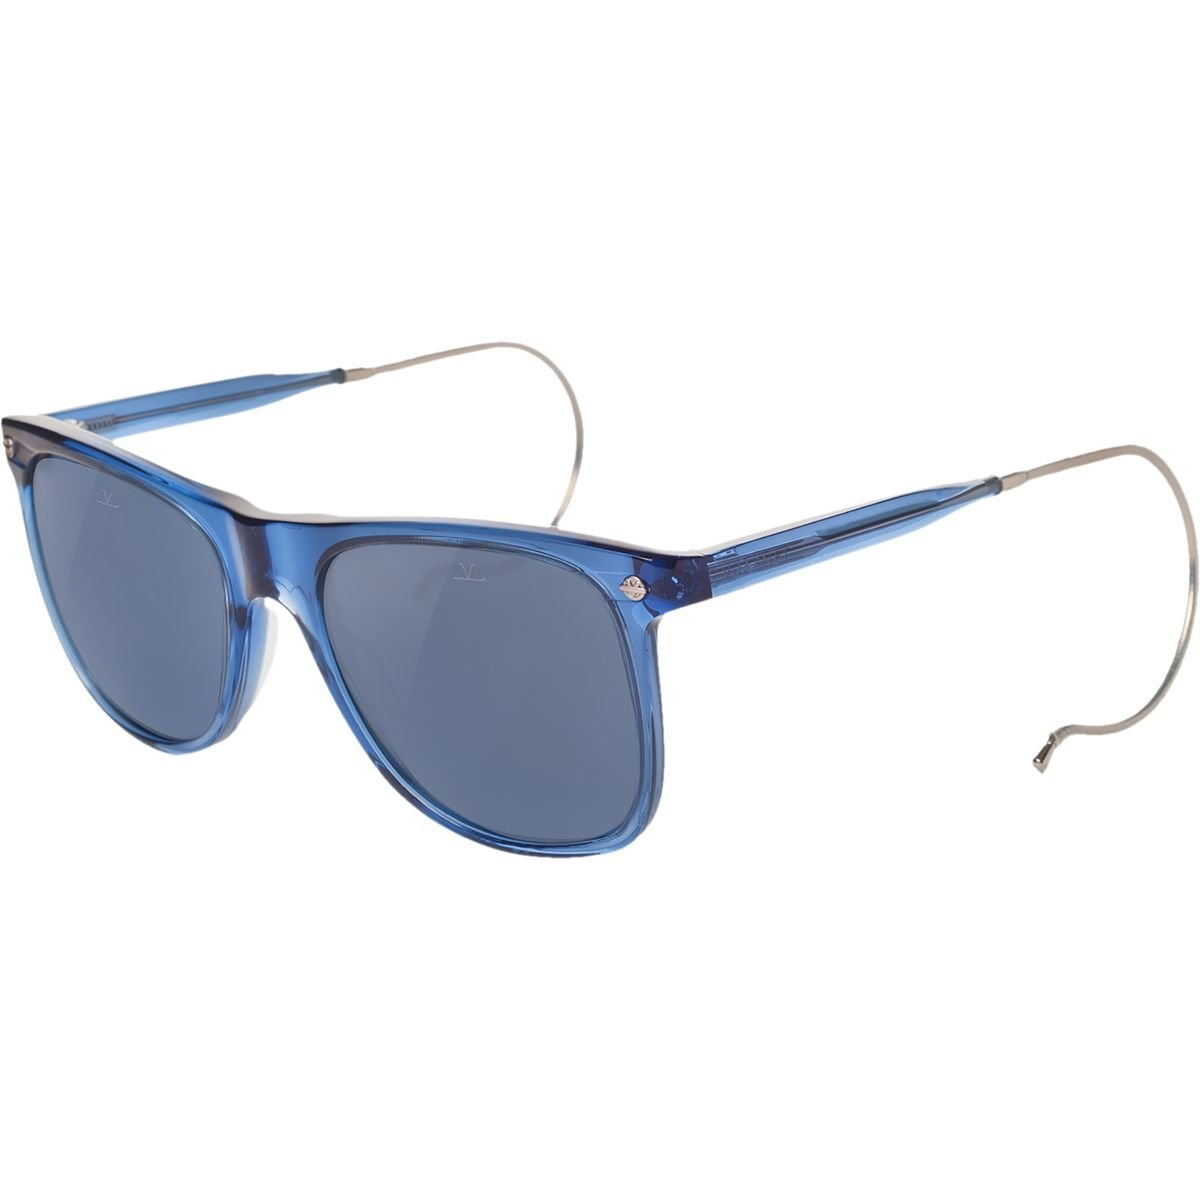 Vuarnet VL 1510 Sunglasses - Polarized Blue/ Polar Blue, One Size